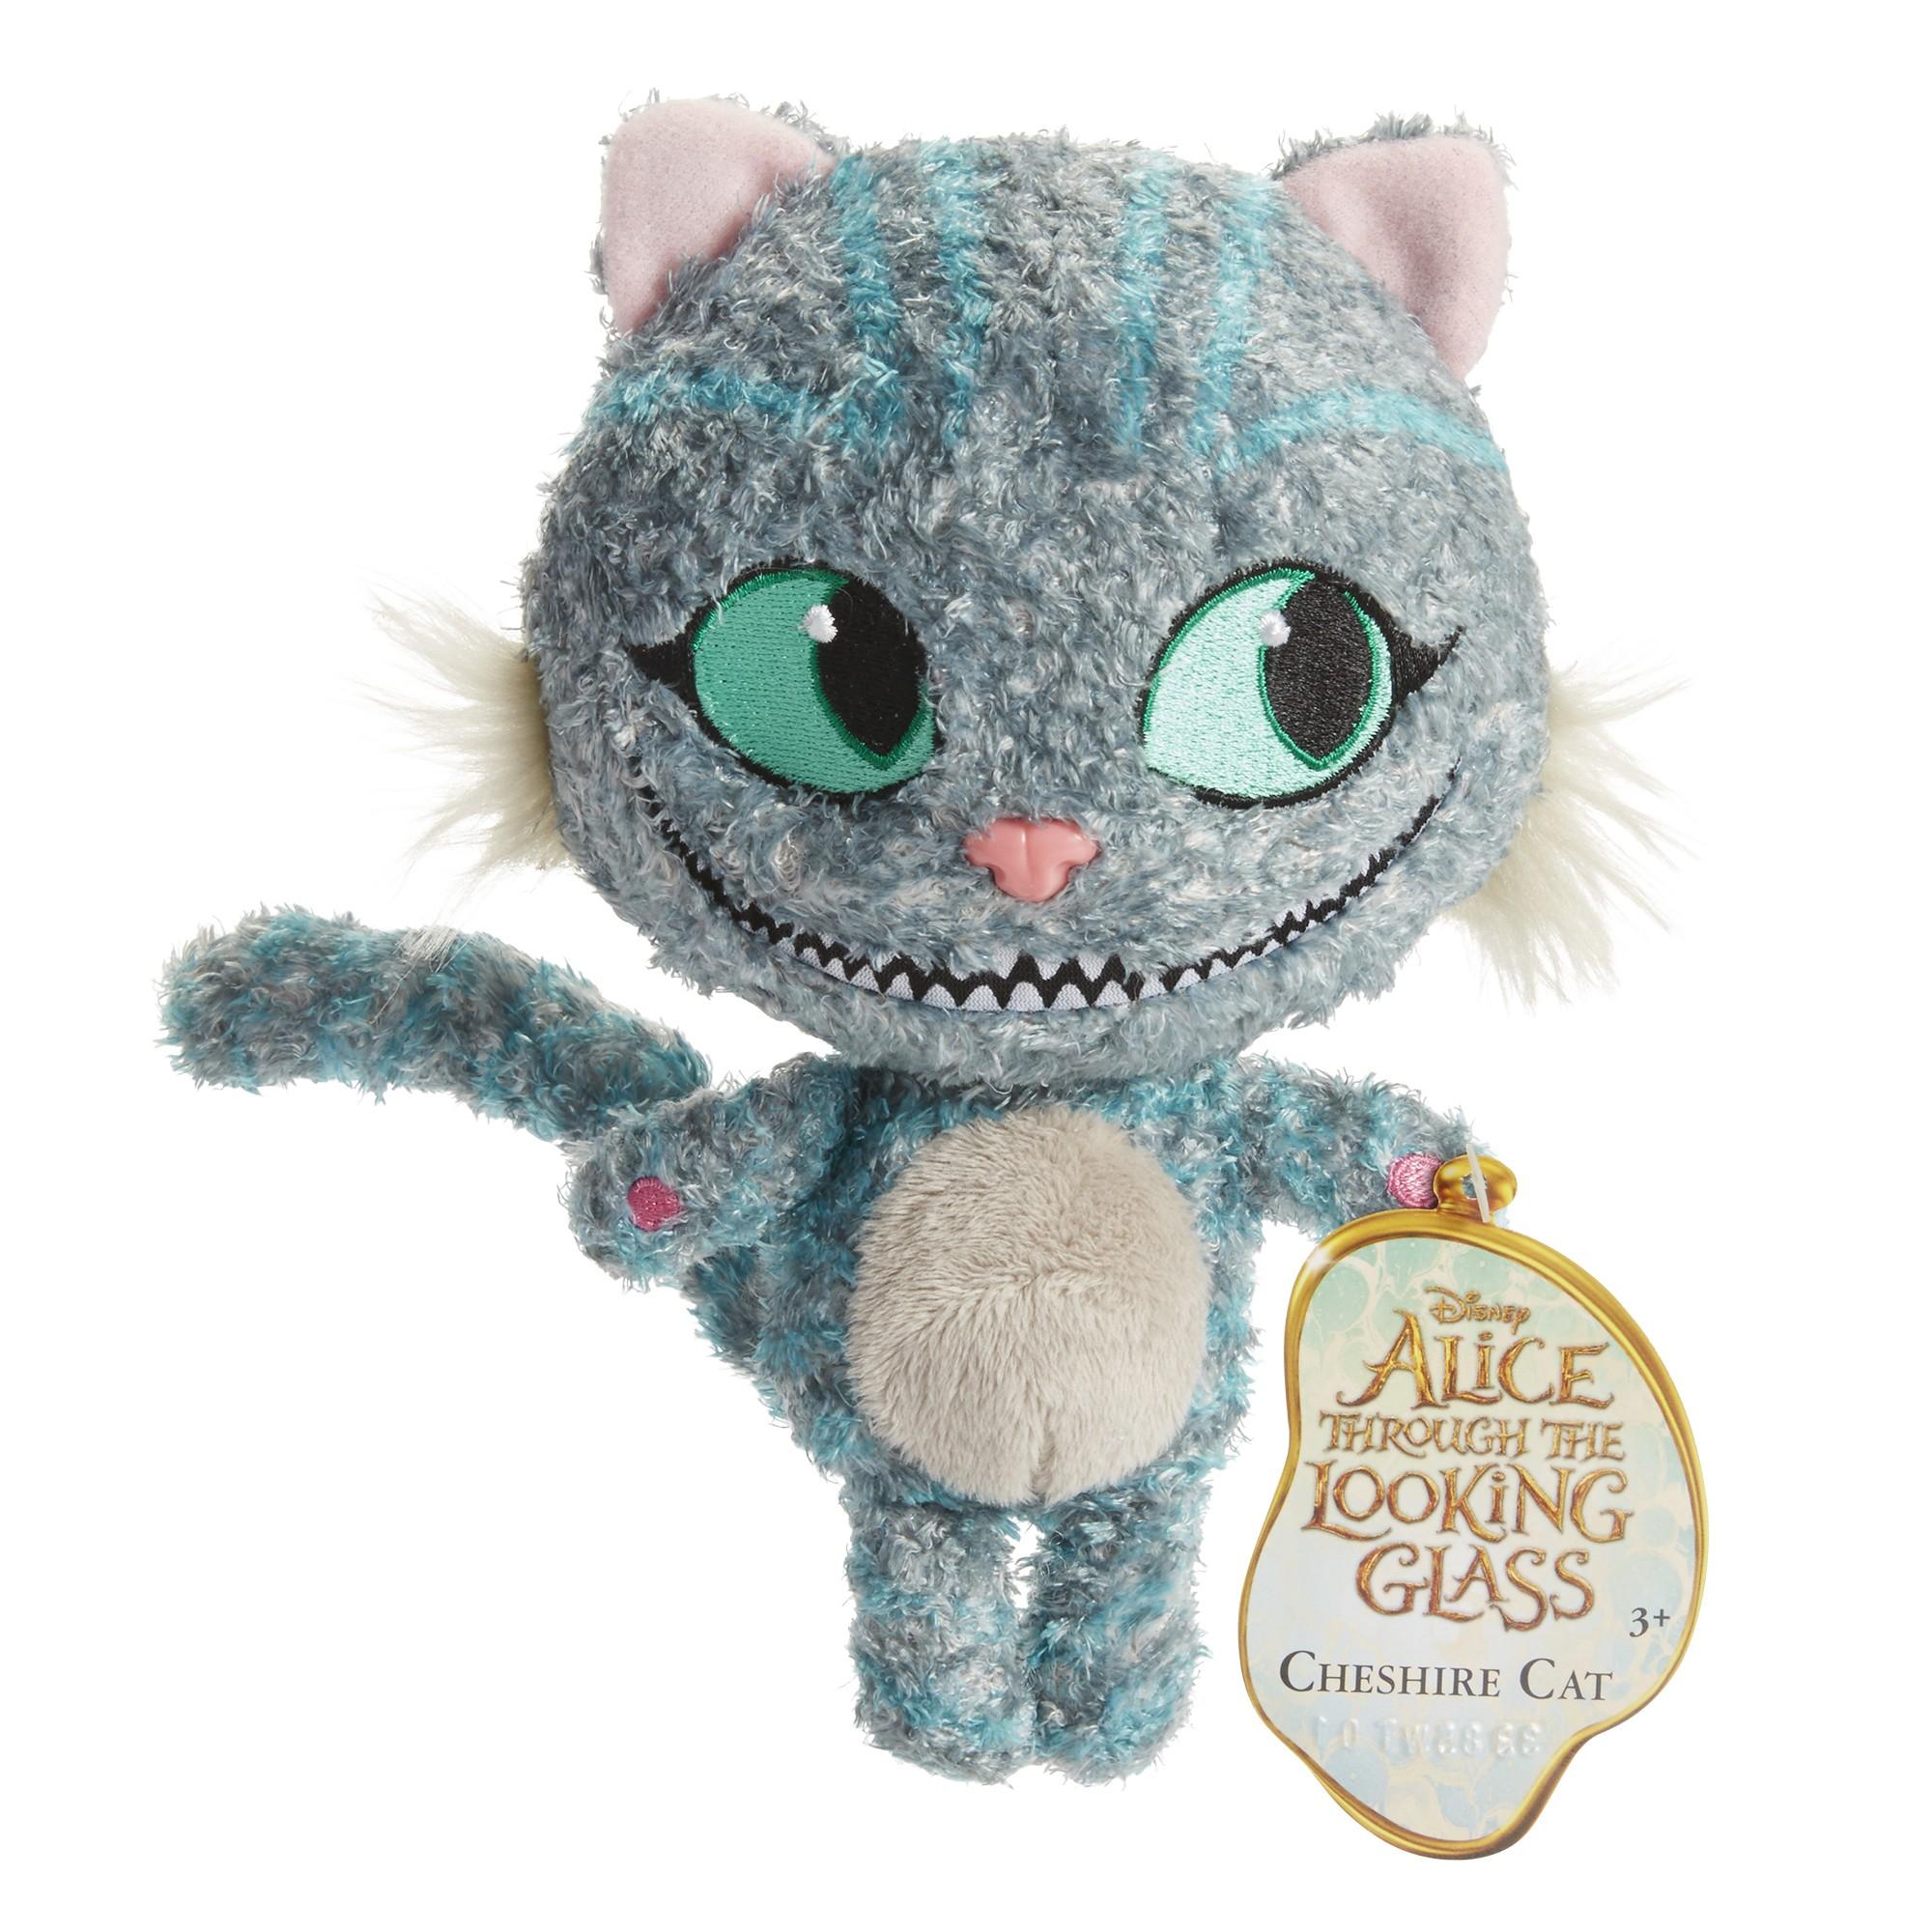 Jakks Pacific Плюшевая игрушка Алиса в стране чудес – Чеширский Кот